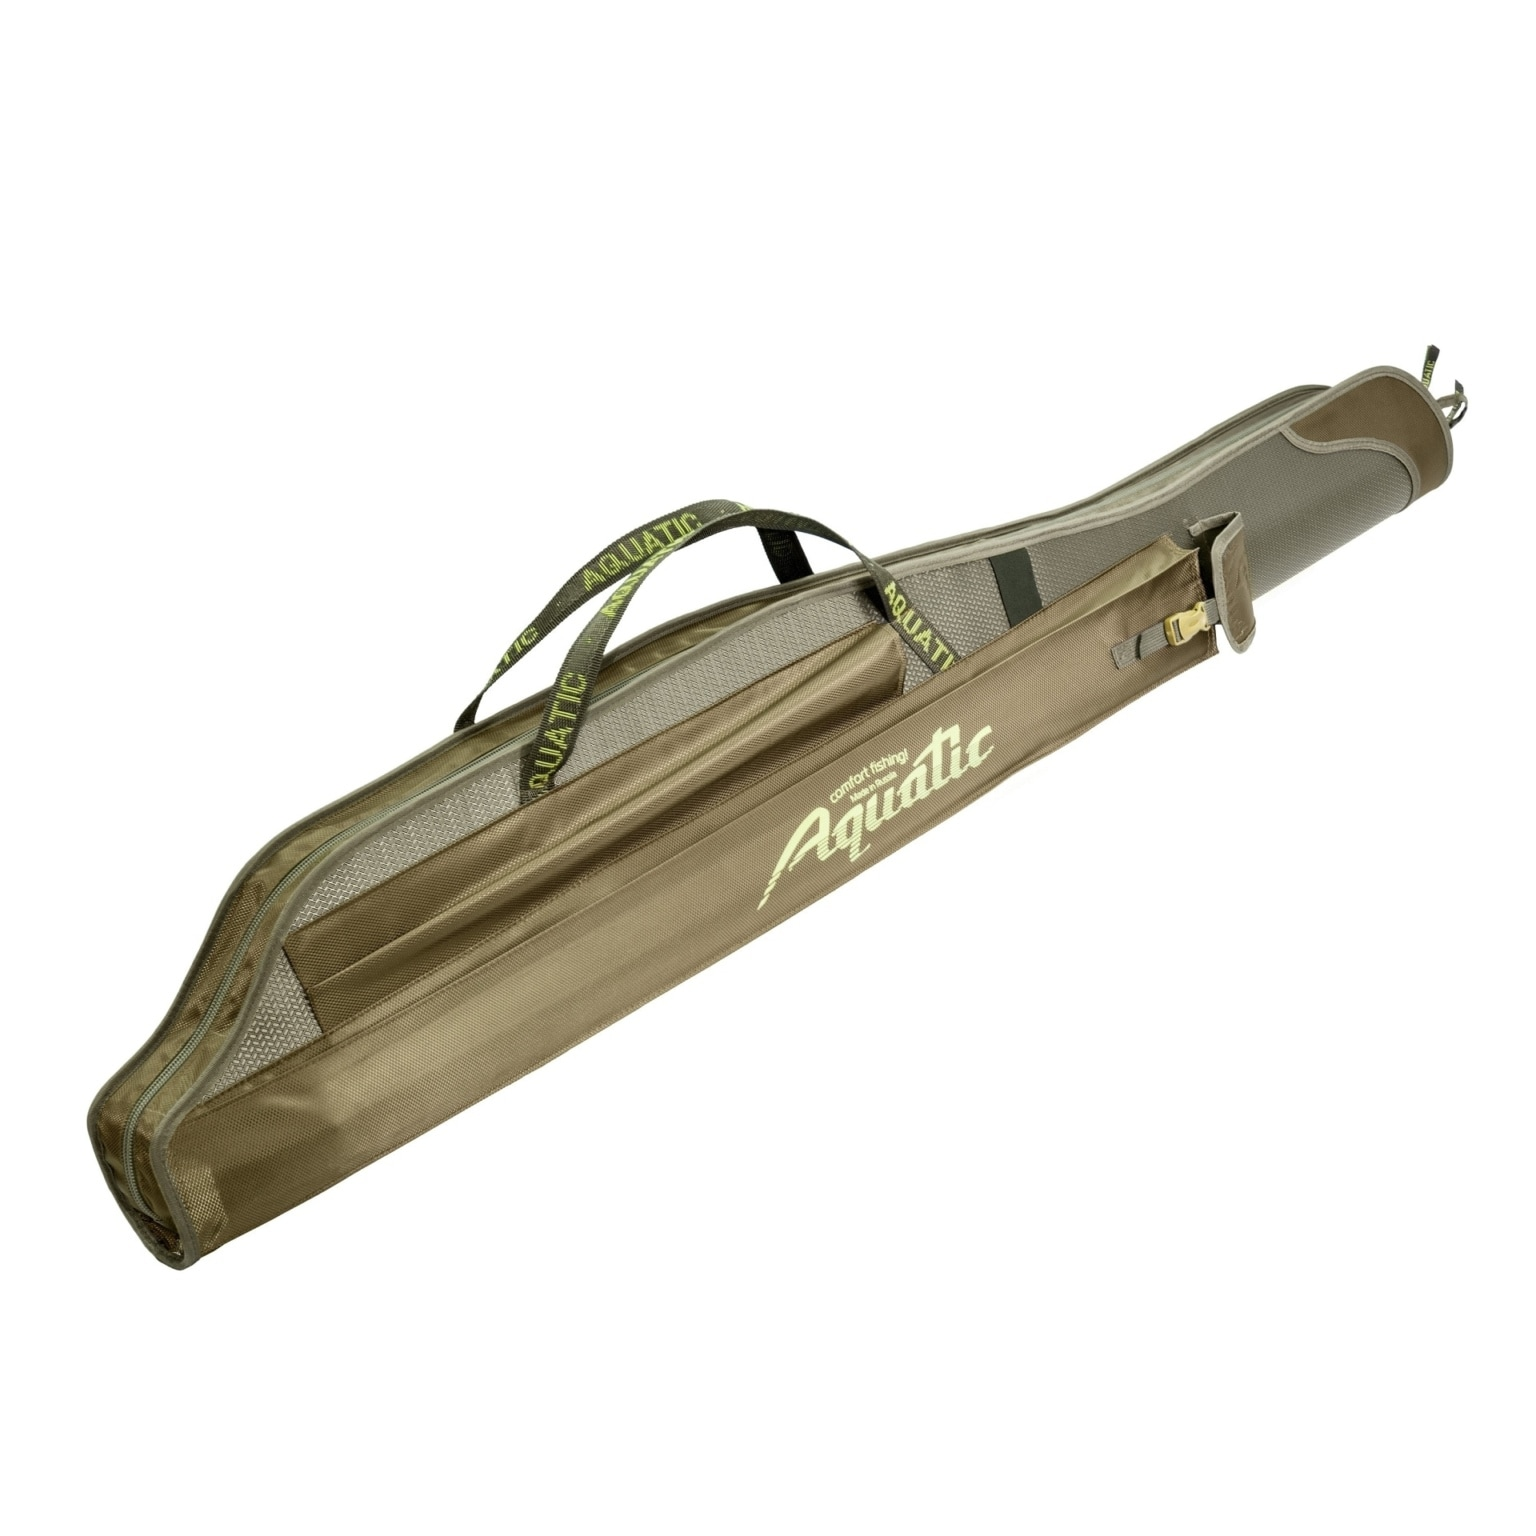 Чехол Aquatic Ч-01 мягкий для удилищ